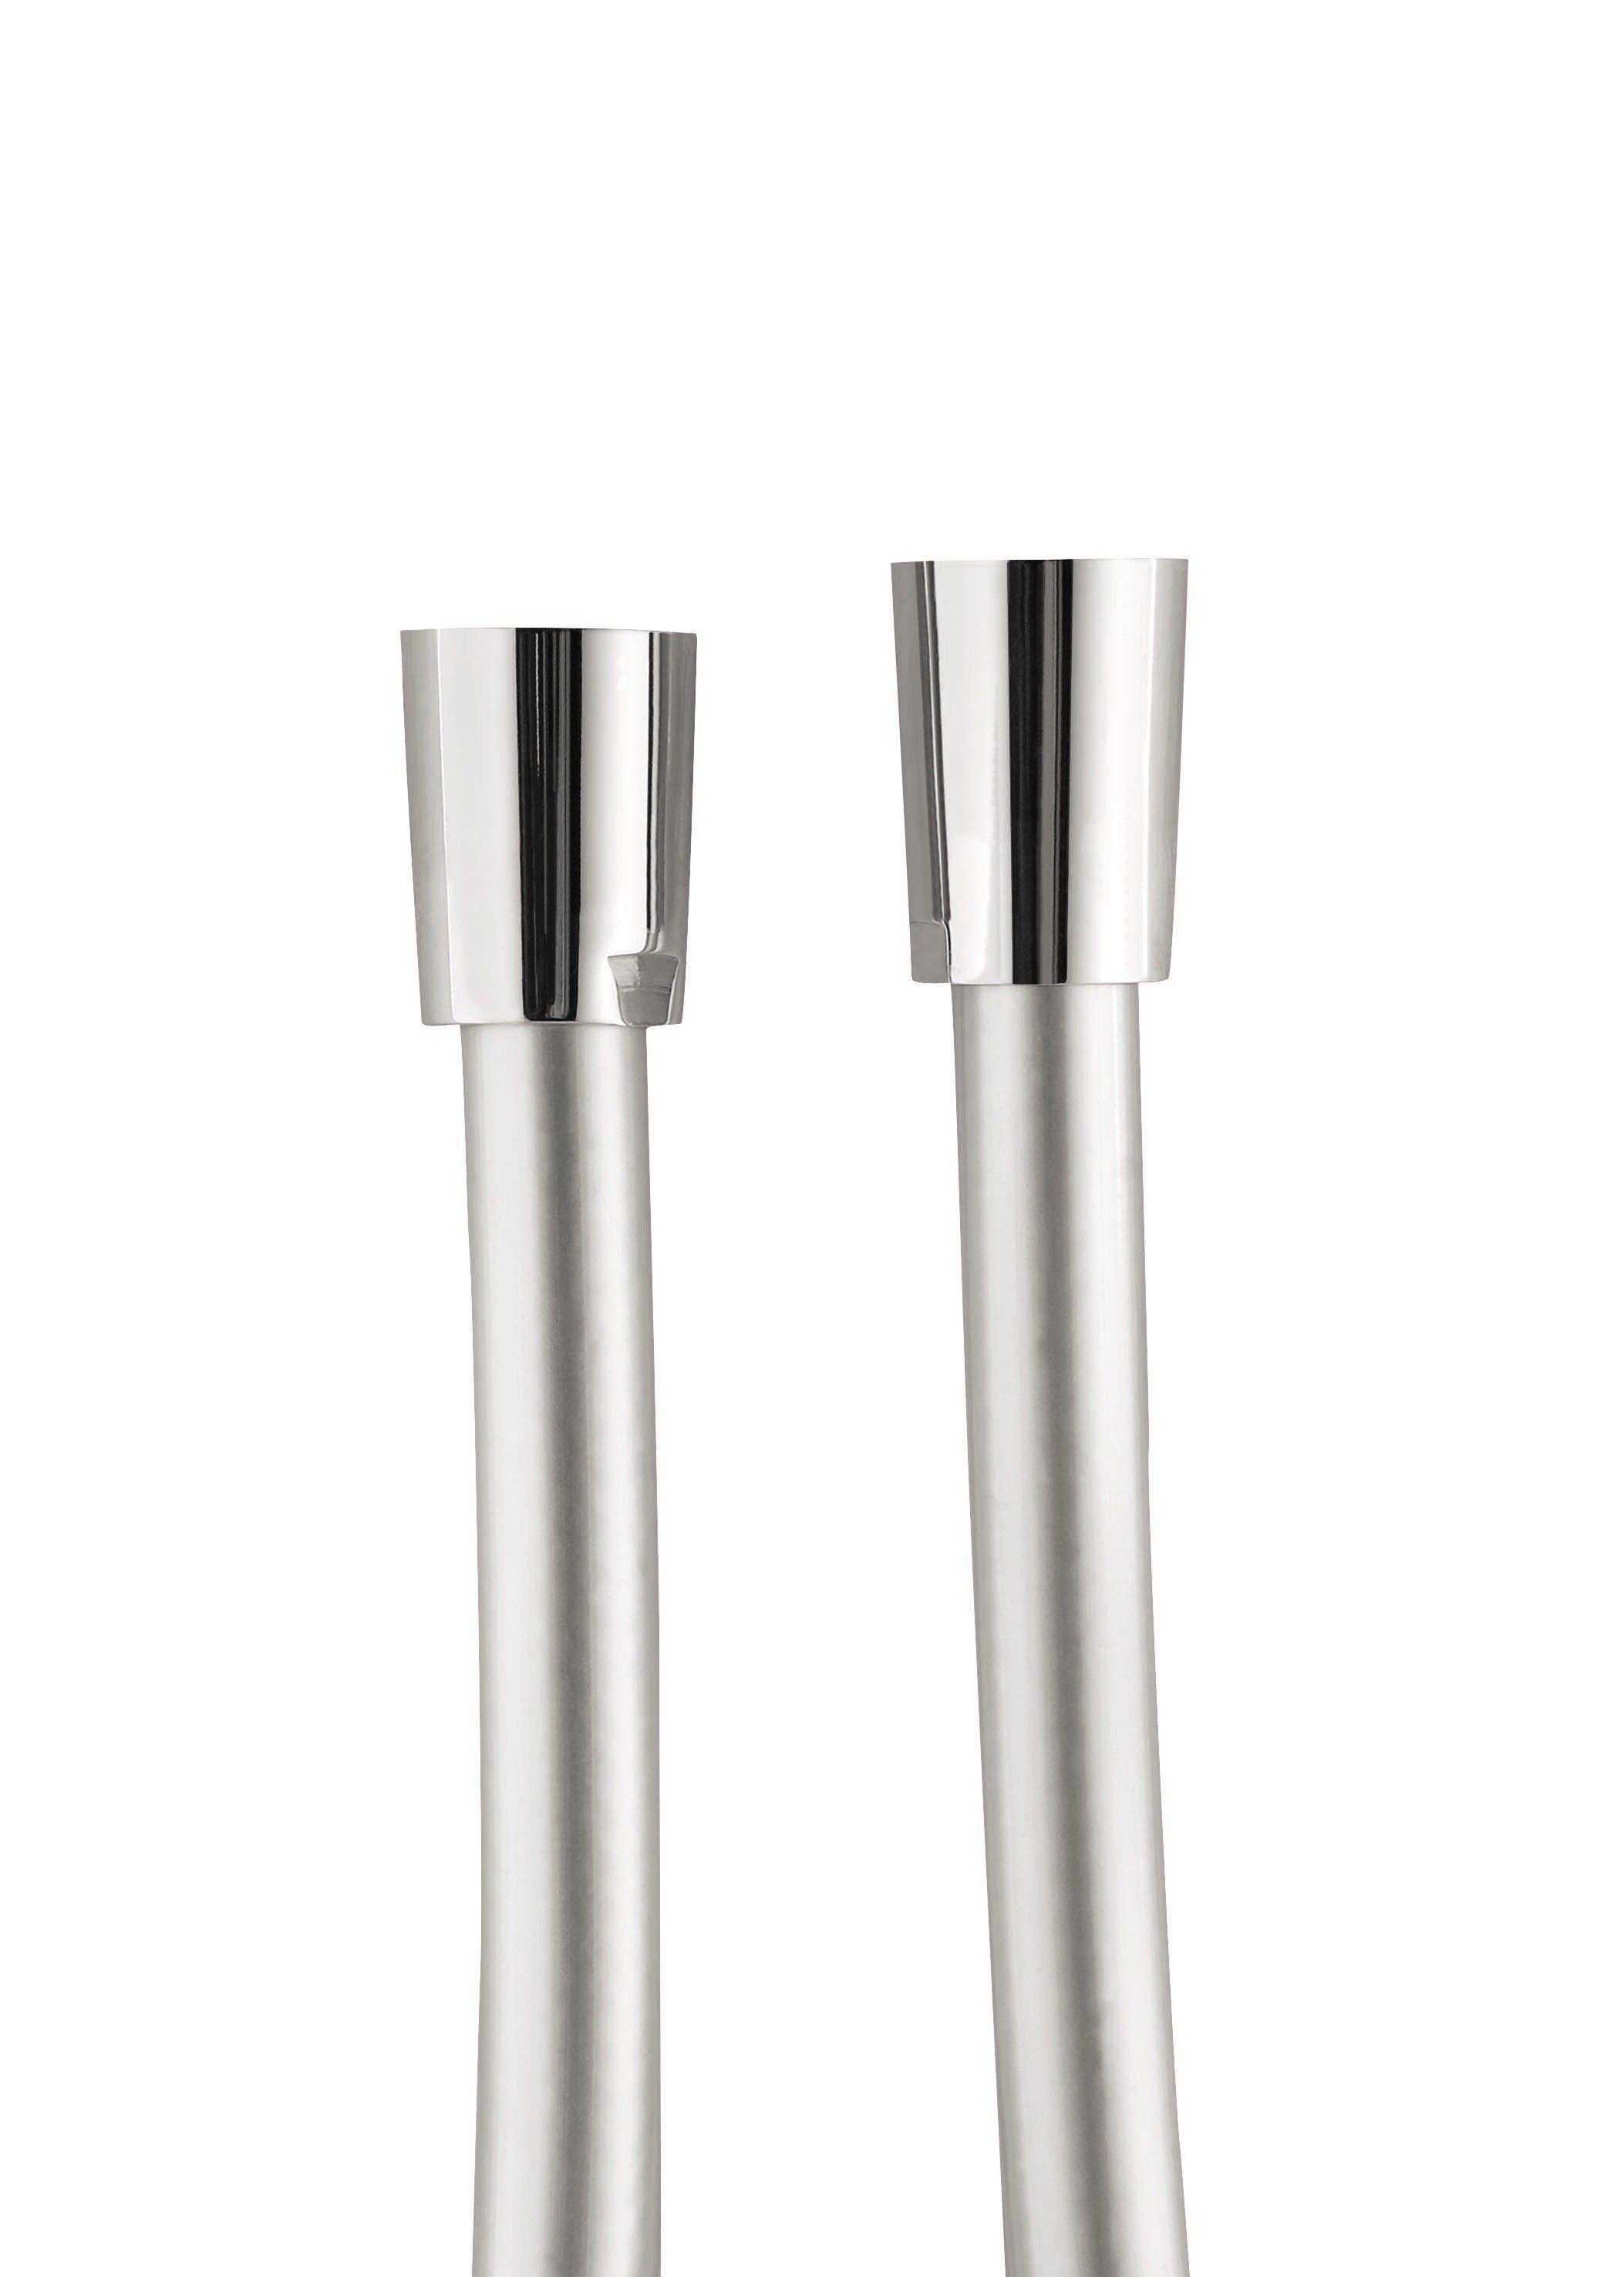 Schulte Duschbrausenschlauch »Silber«, 150 cm